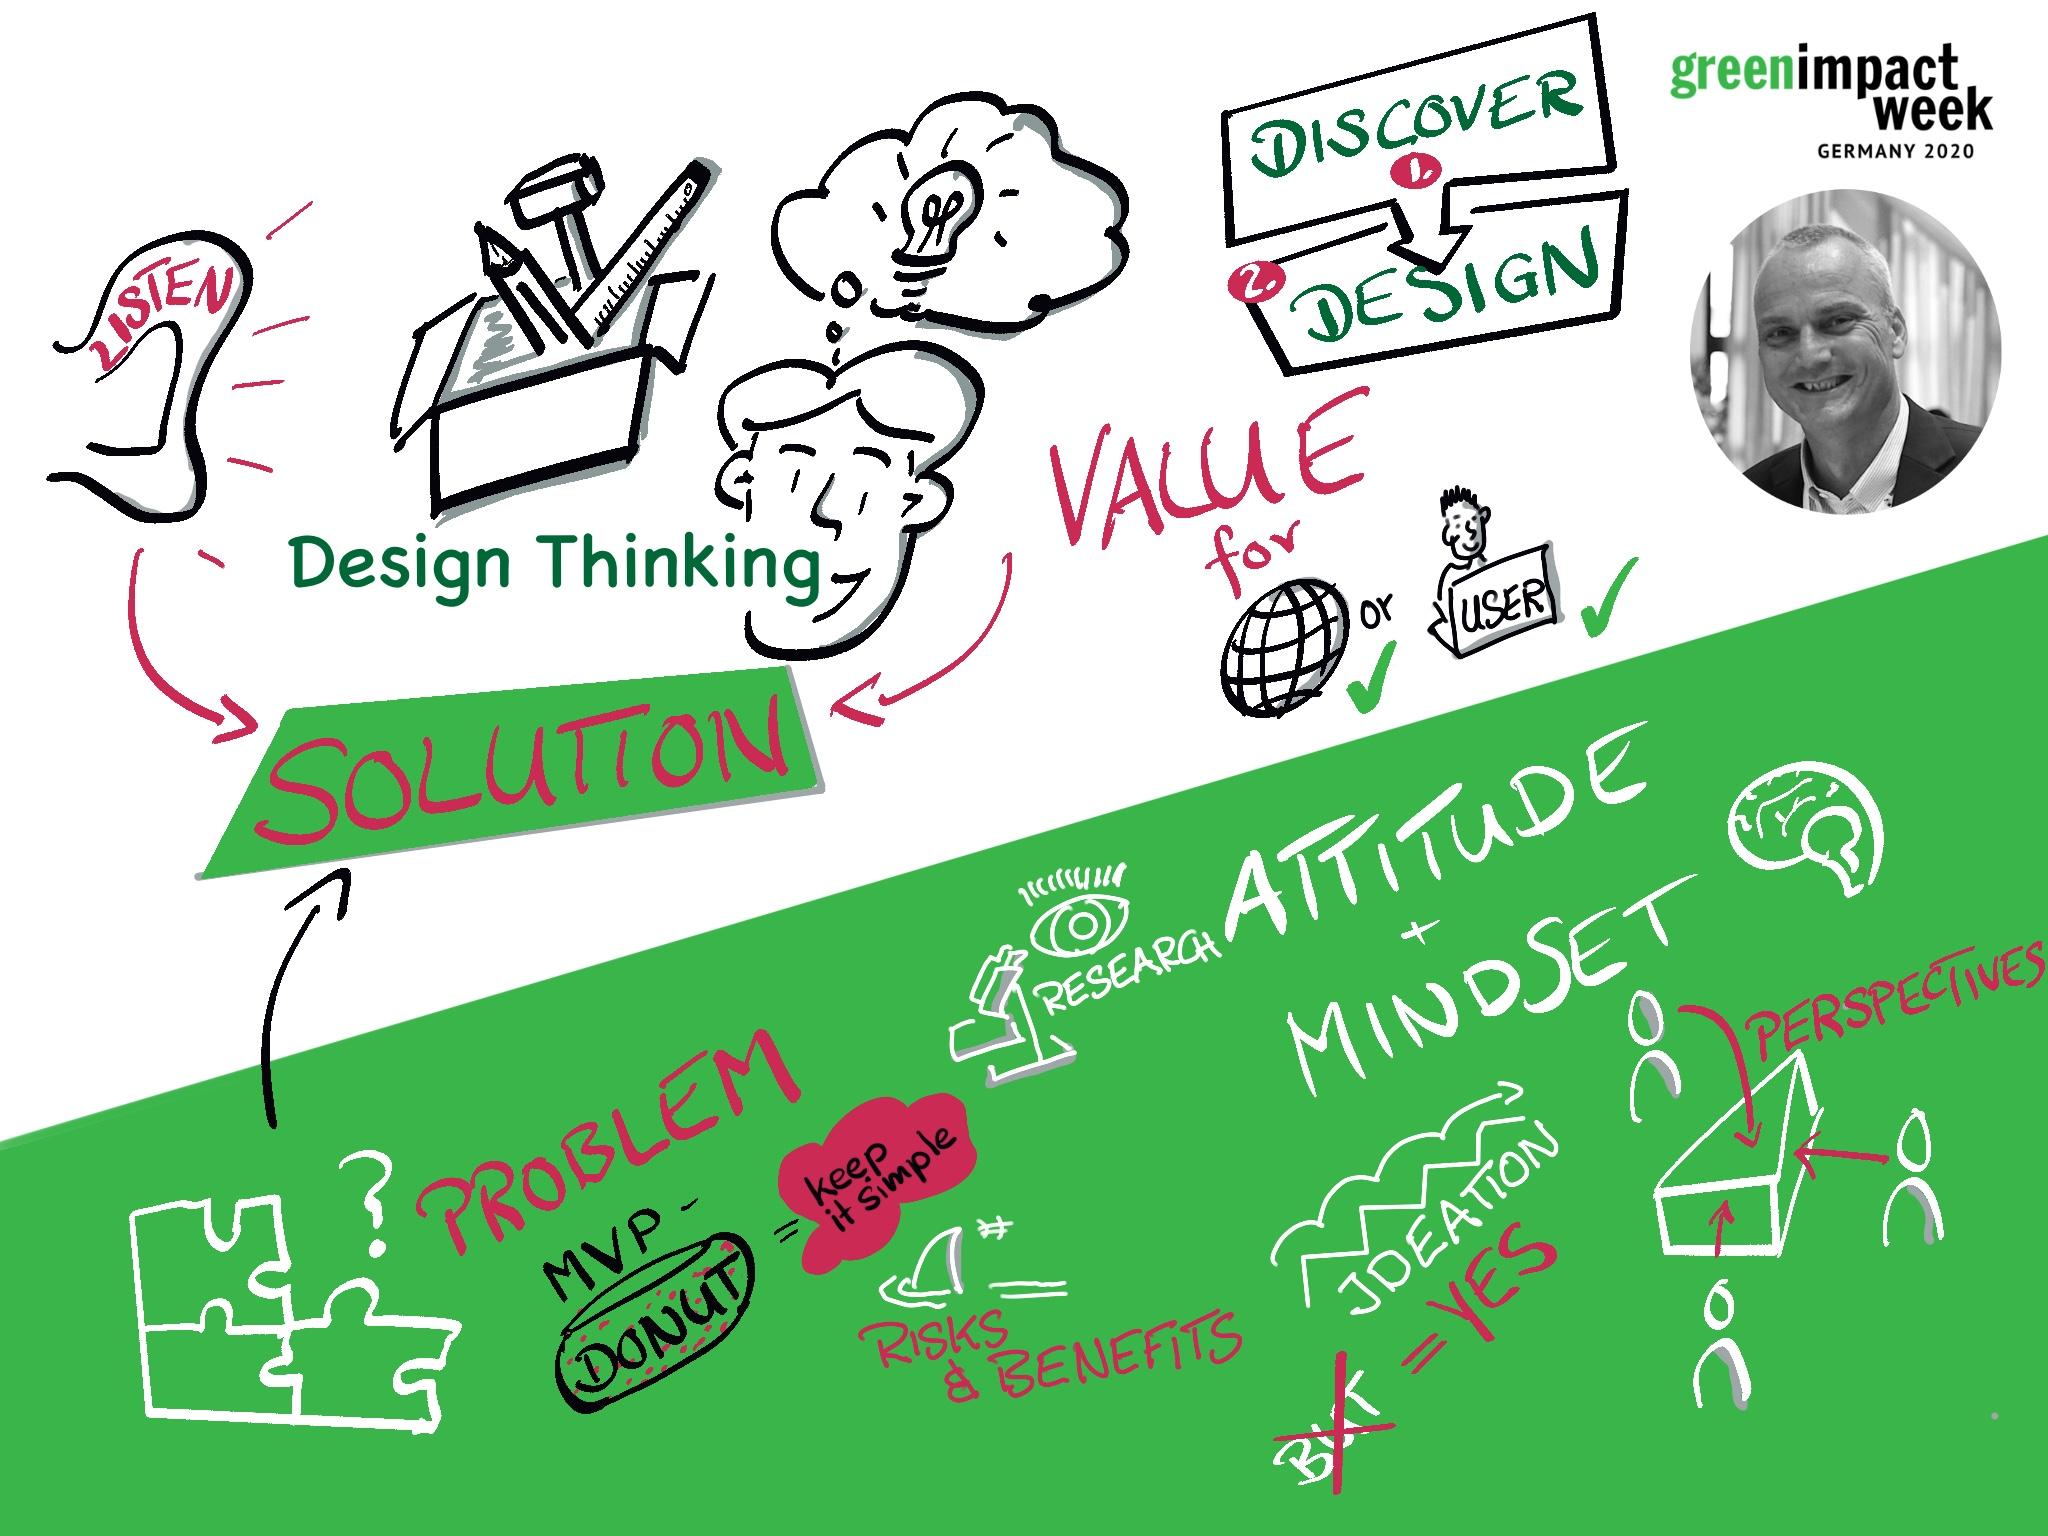 Graphic Recording - Keynote Design Thinking - Joern Bruecker - Green Impact Week Germany 2020 visualization by Markus Eichel from facilitation.space